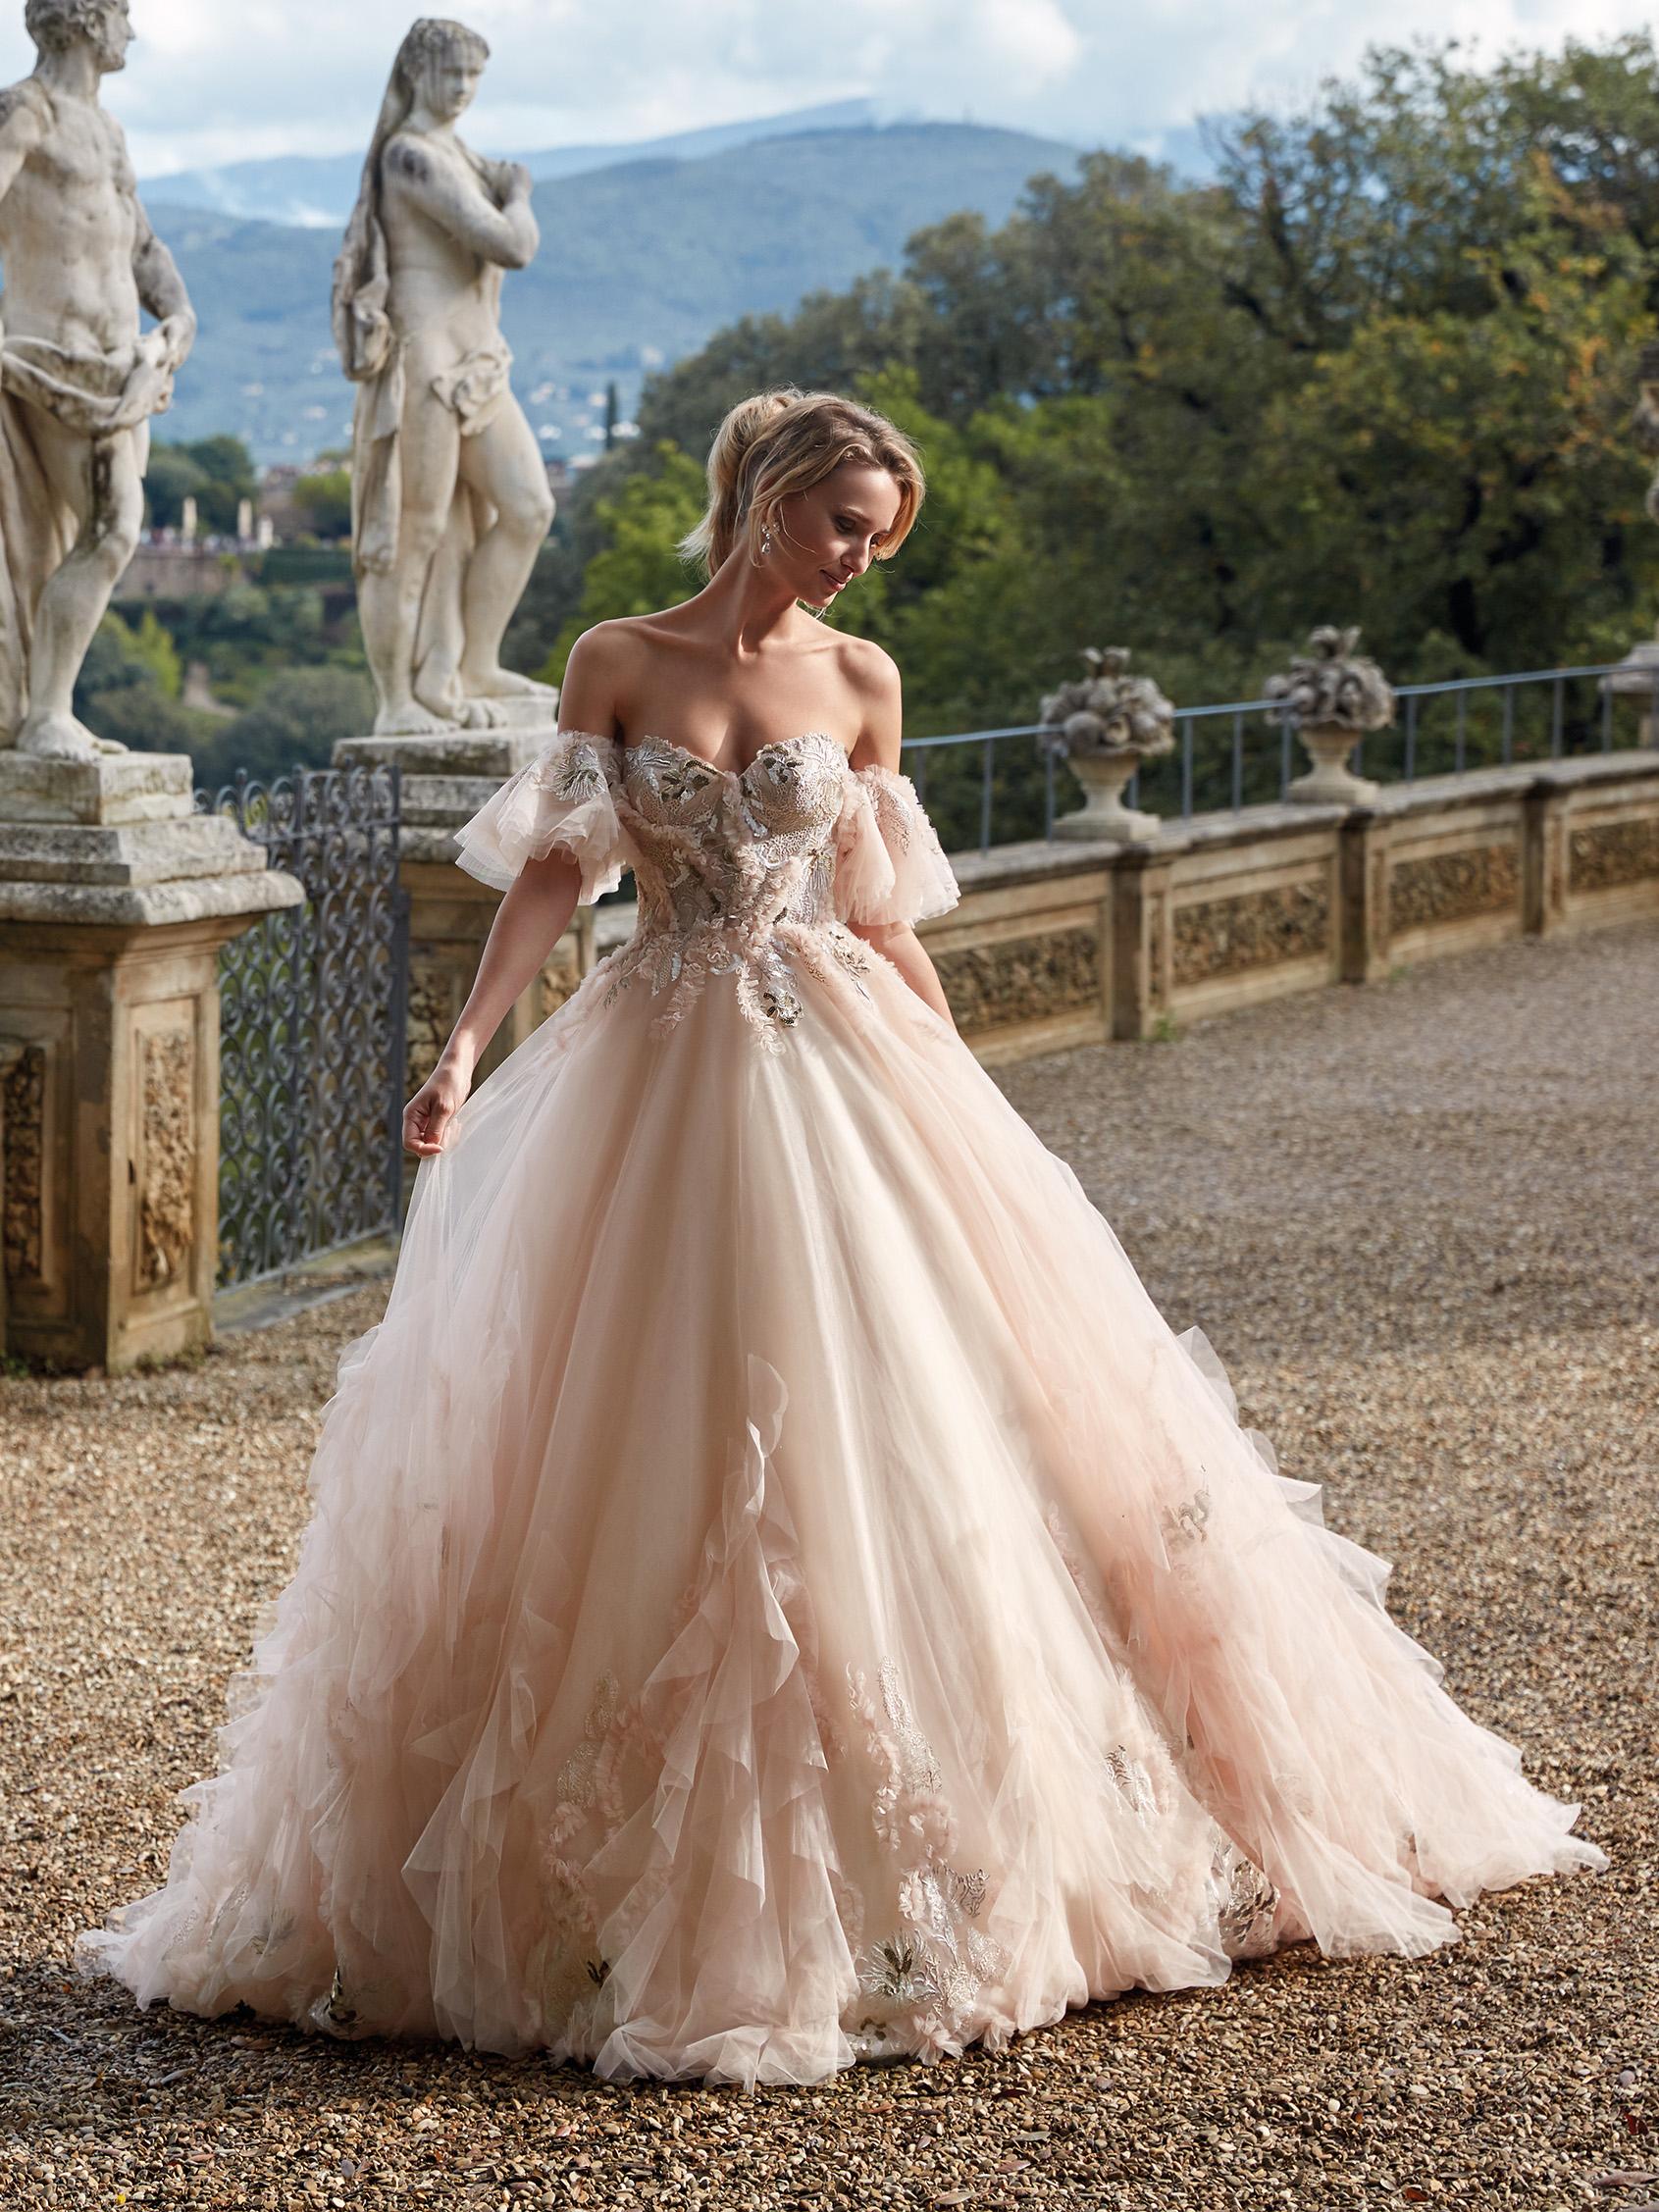 Nicole - Charming Florence